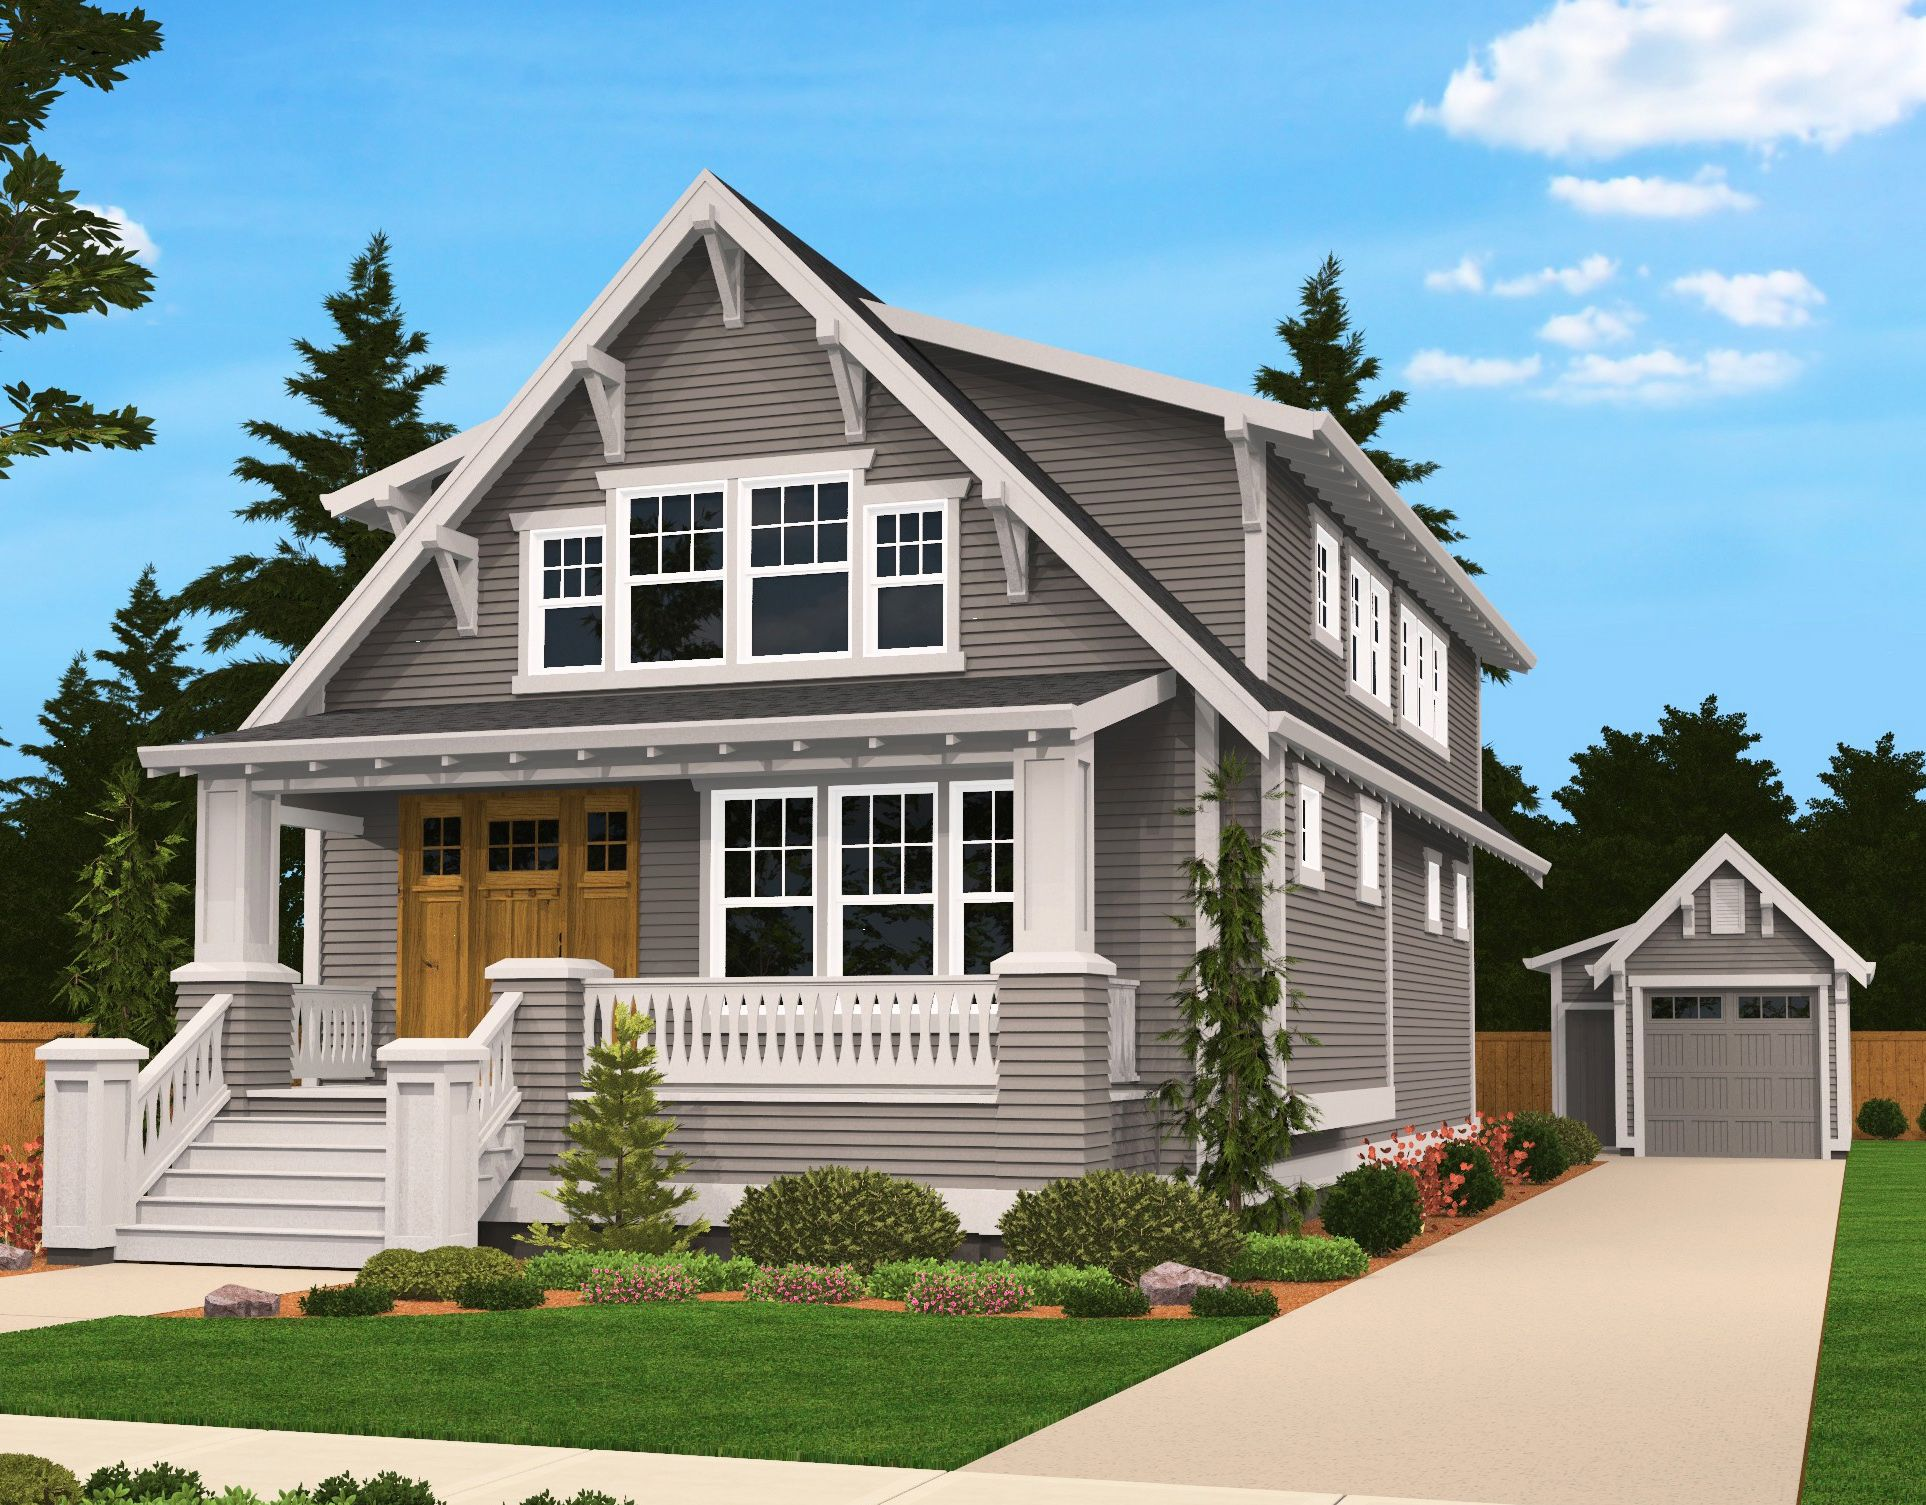 Plan 85058ms Handsome Bungalow House Plan Craftsman